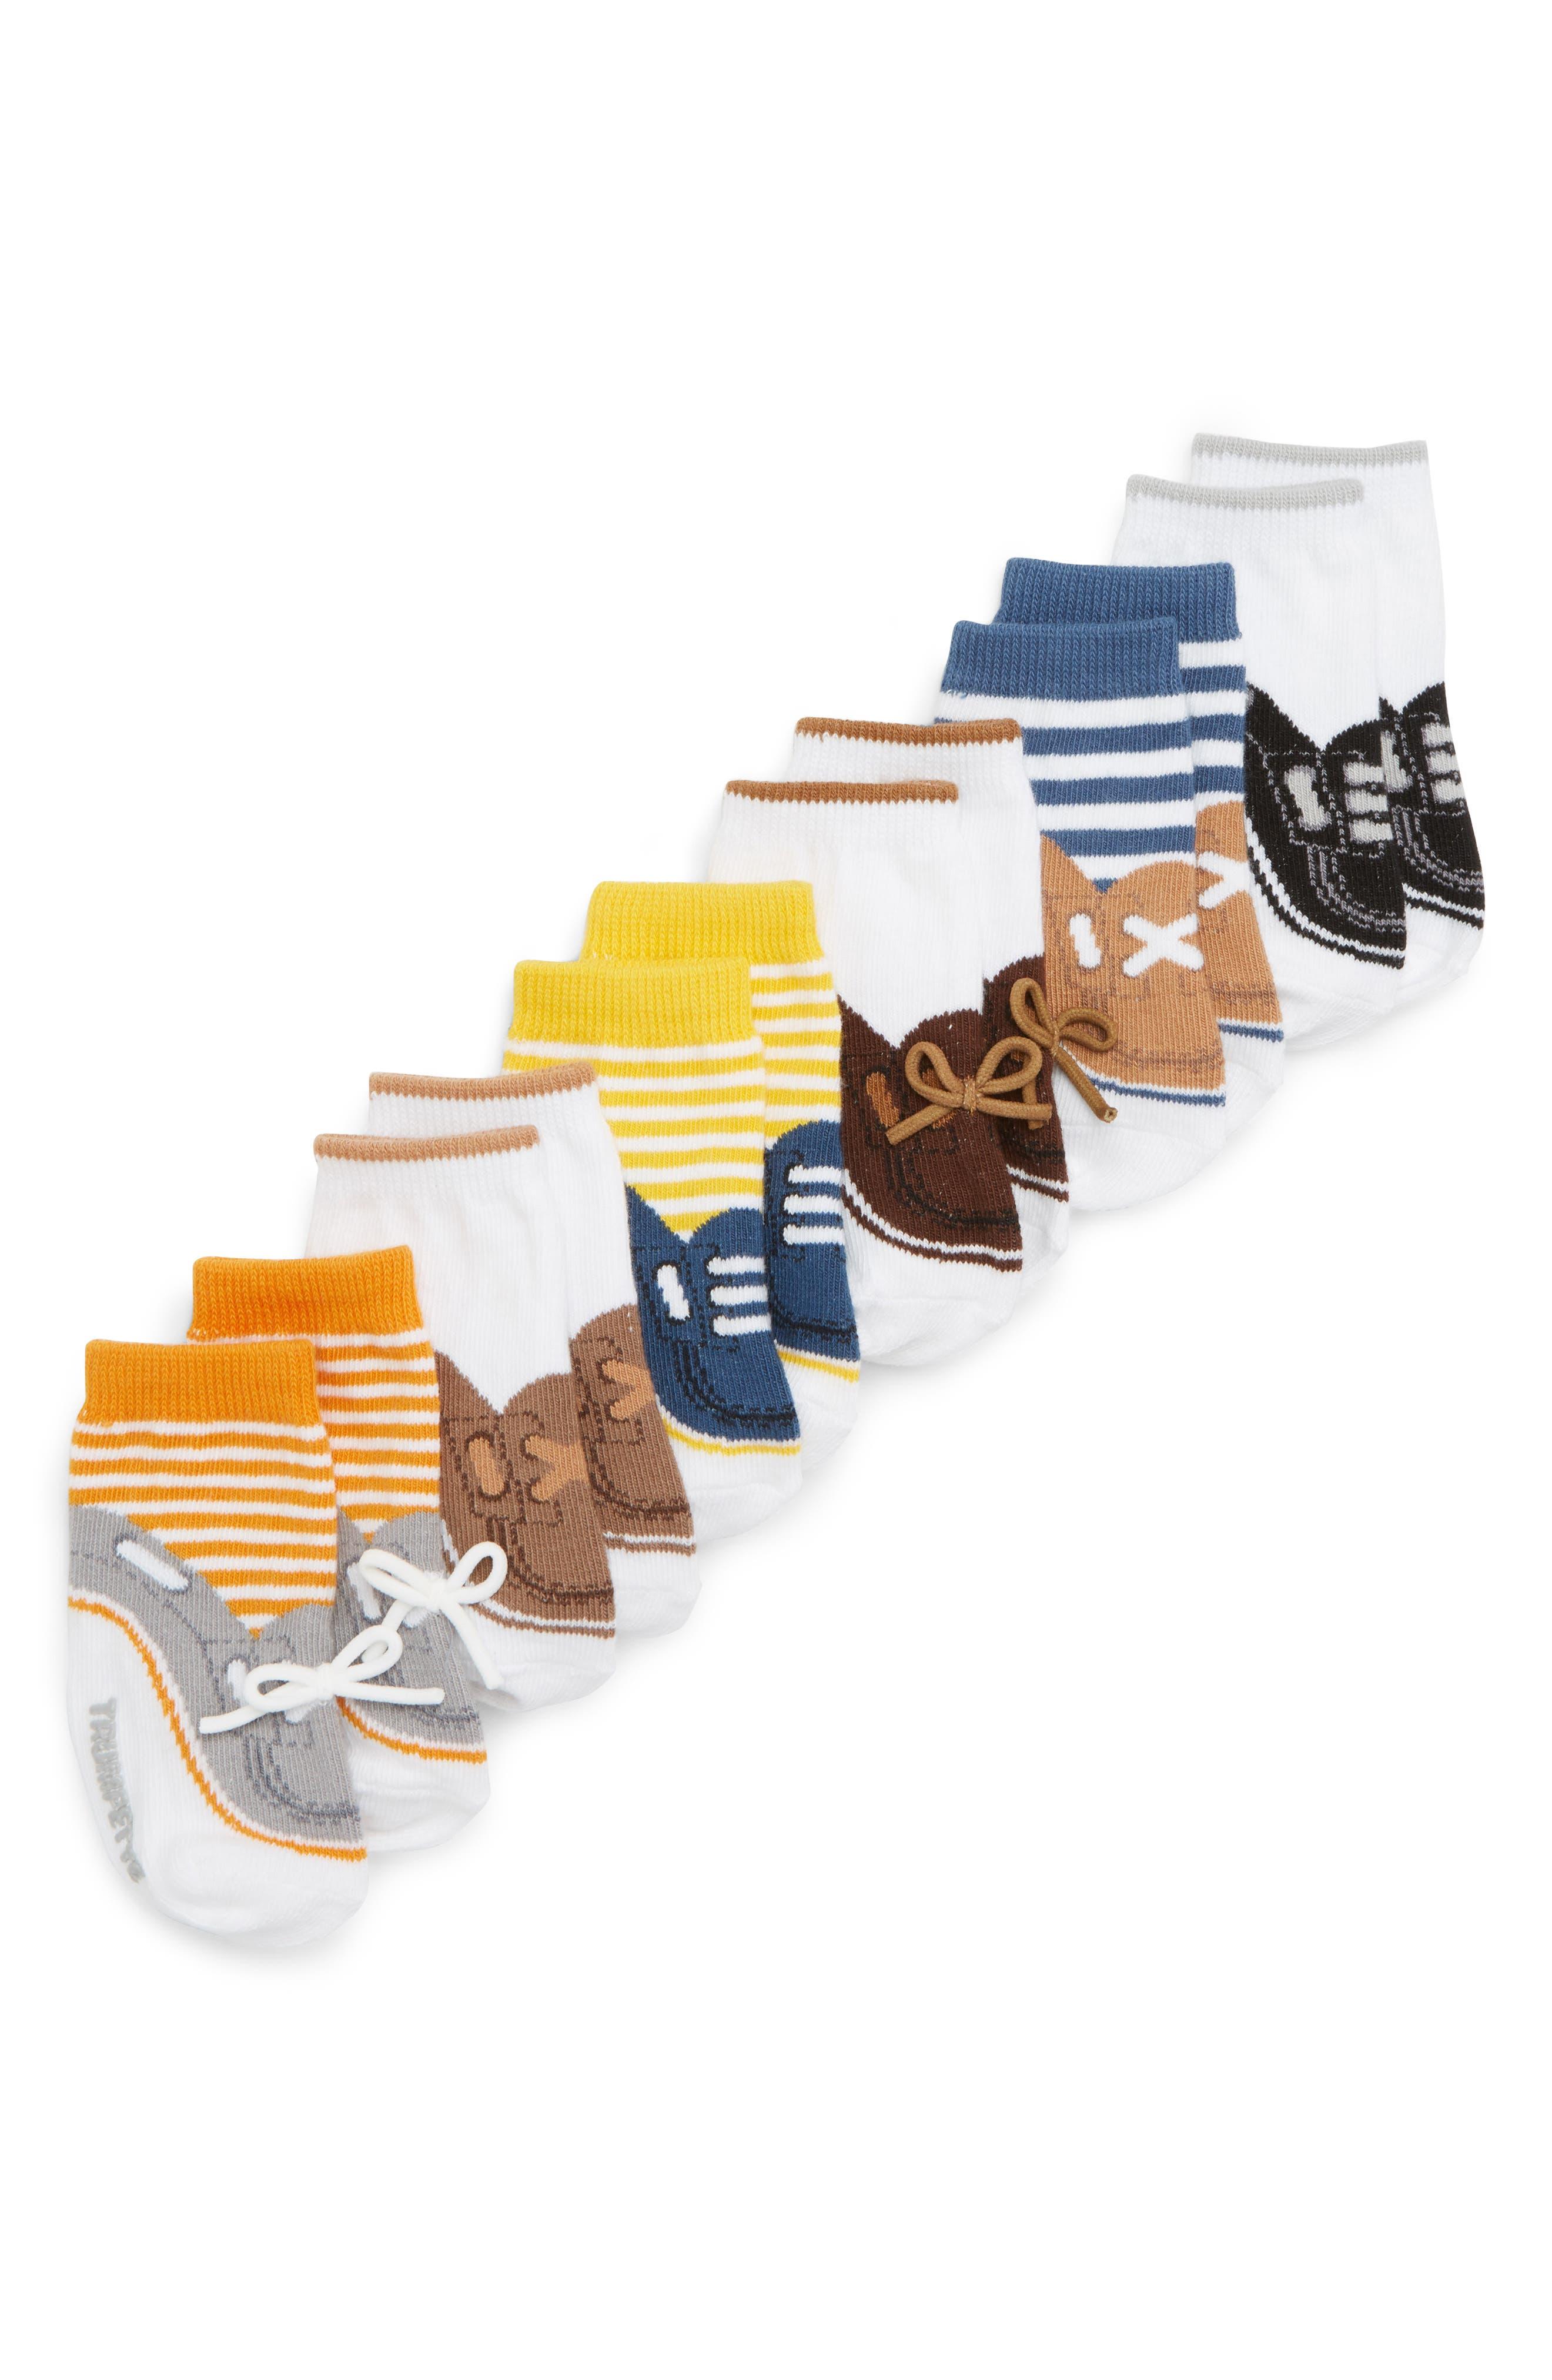 Noah 6-Pack Socks,                             Alternate thumbnail 2, color,                             ASSORTED NEUTRAL